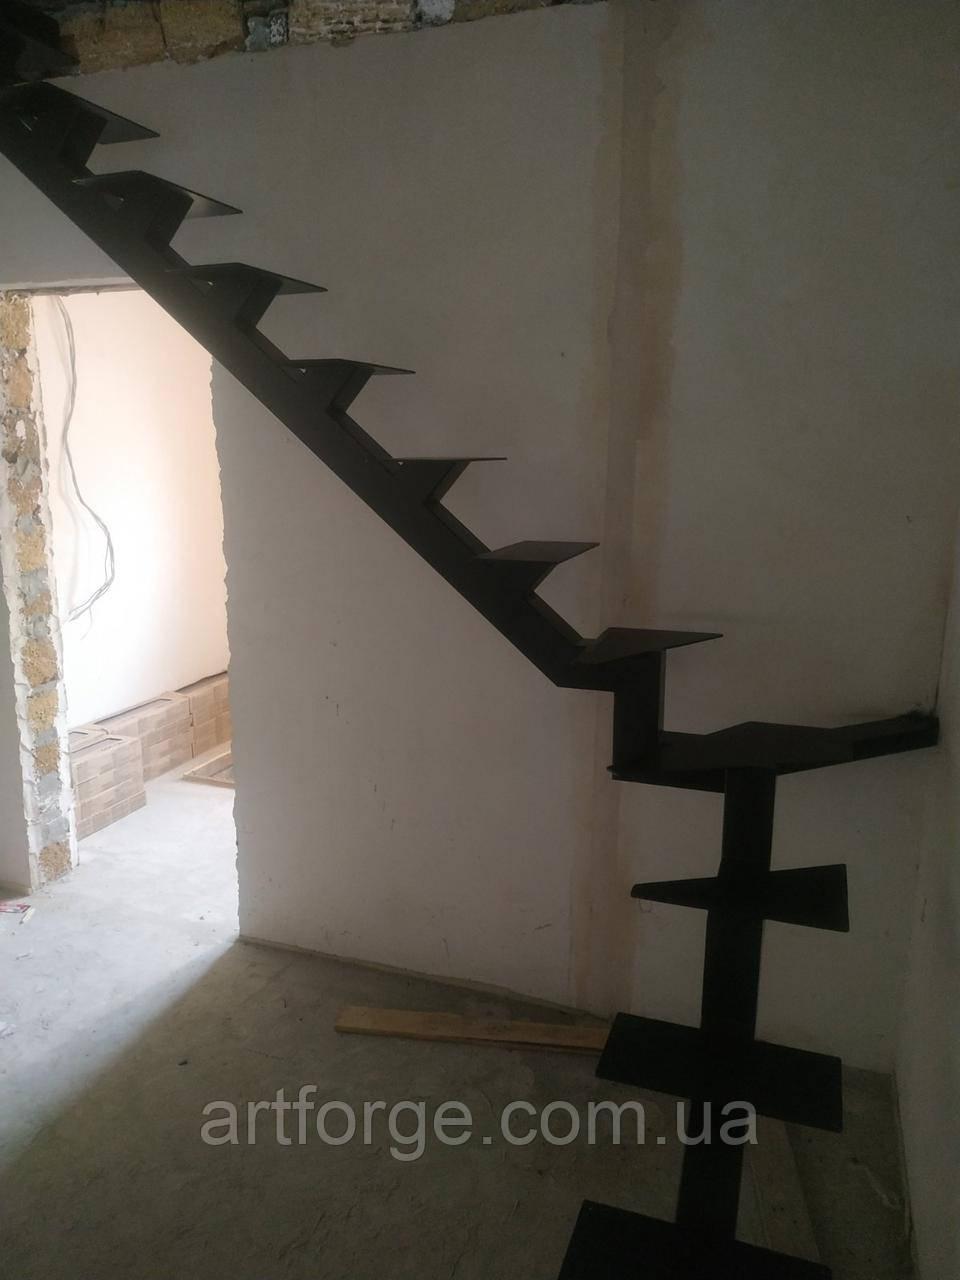 Каркас поворотной лестницы на монокосоуре. Металевий каркас сходів.